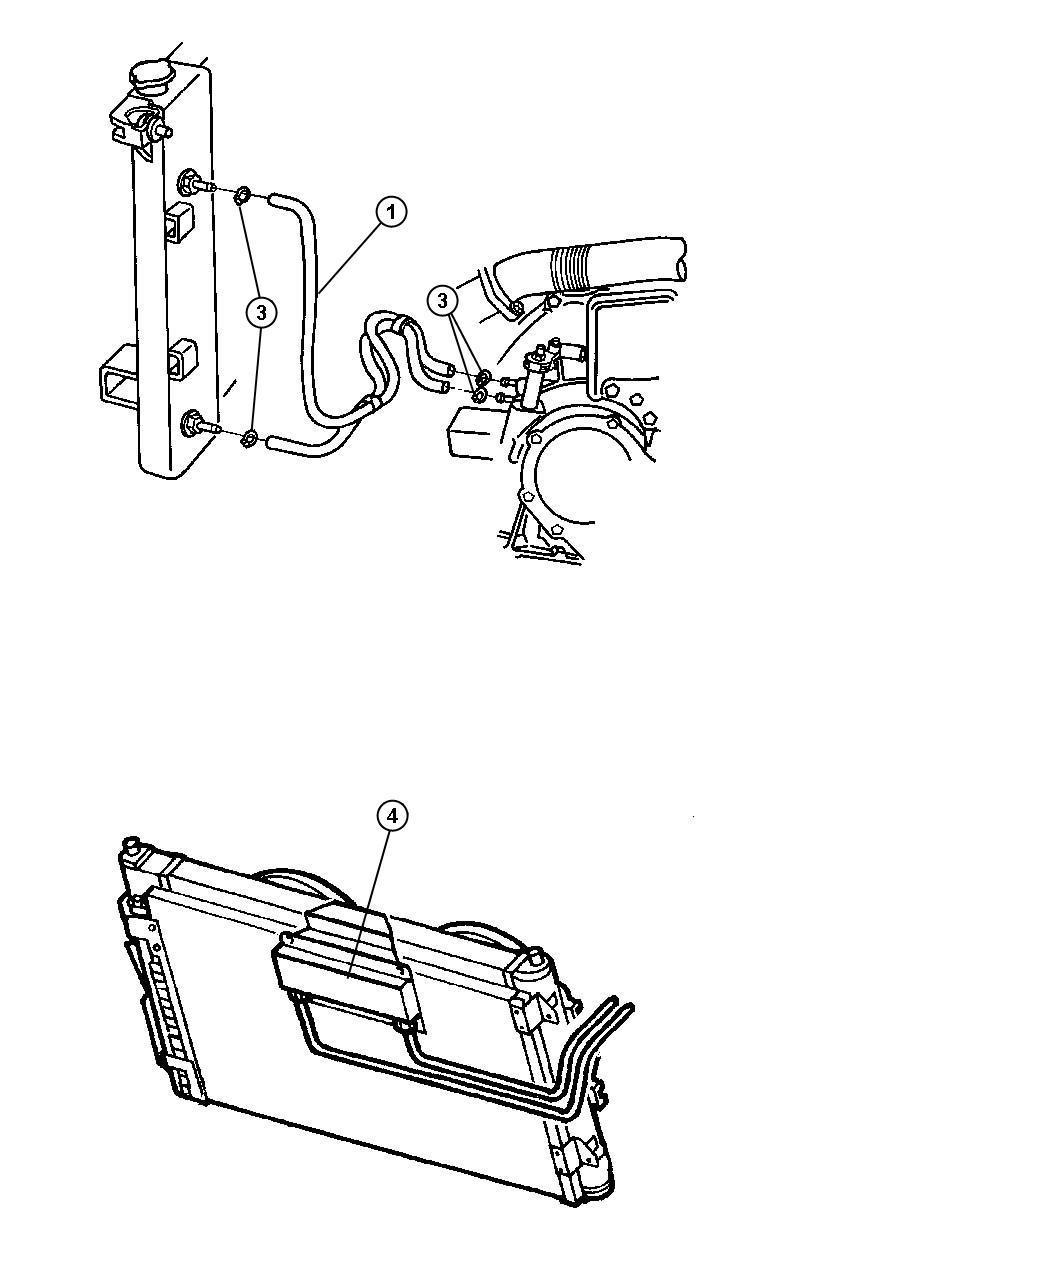 Caravan Transmission Diagram, Caravan, Free Engine Image